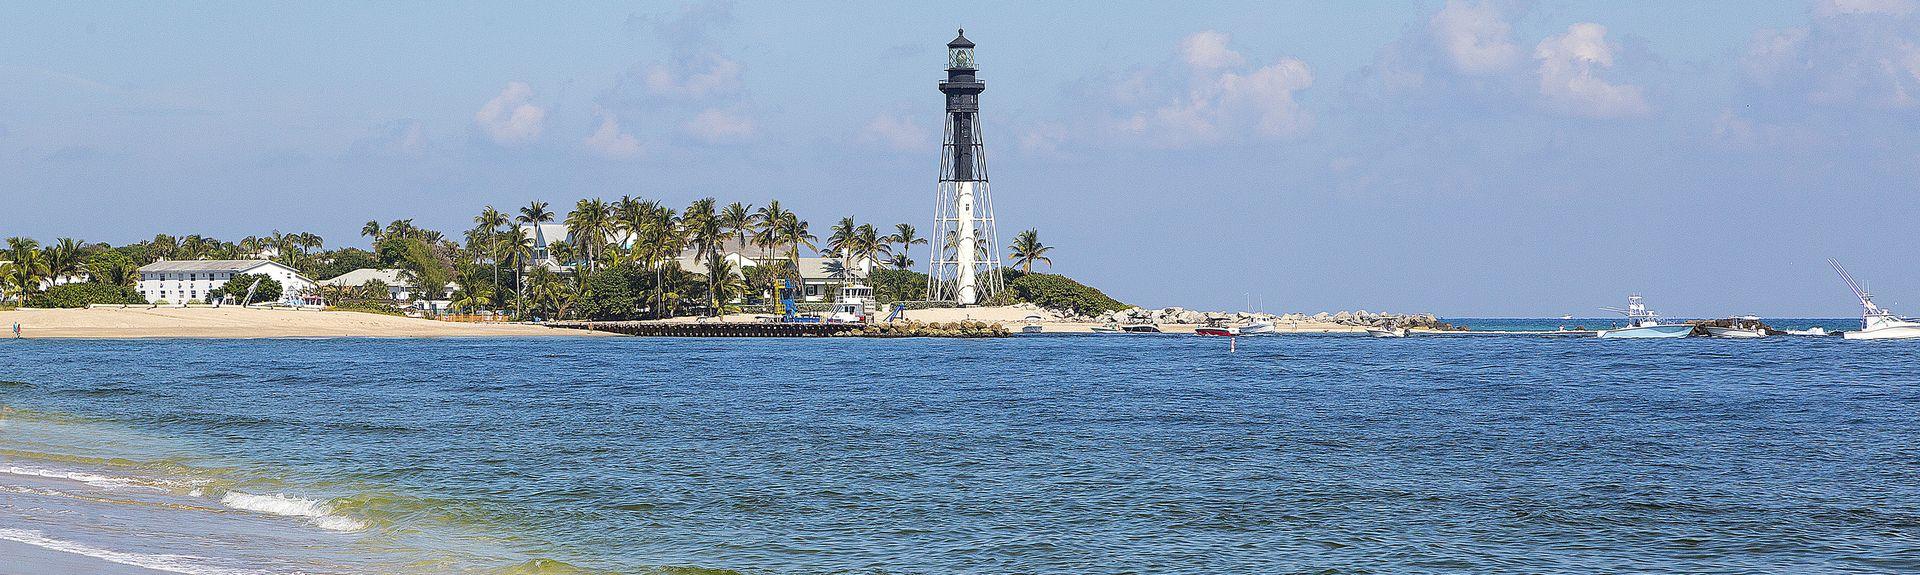 Tamarac, Florida, United States of America